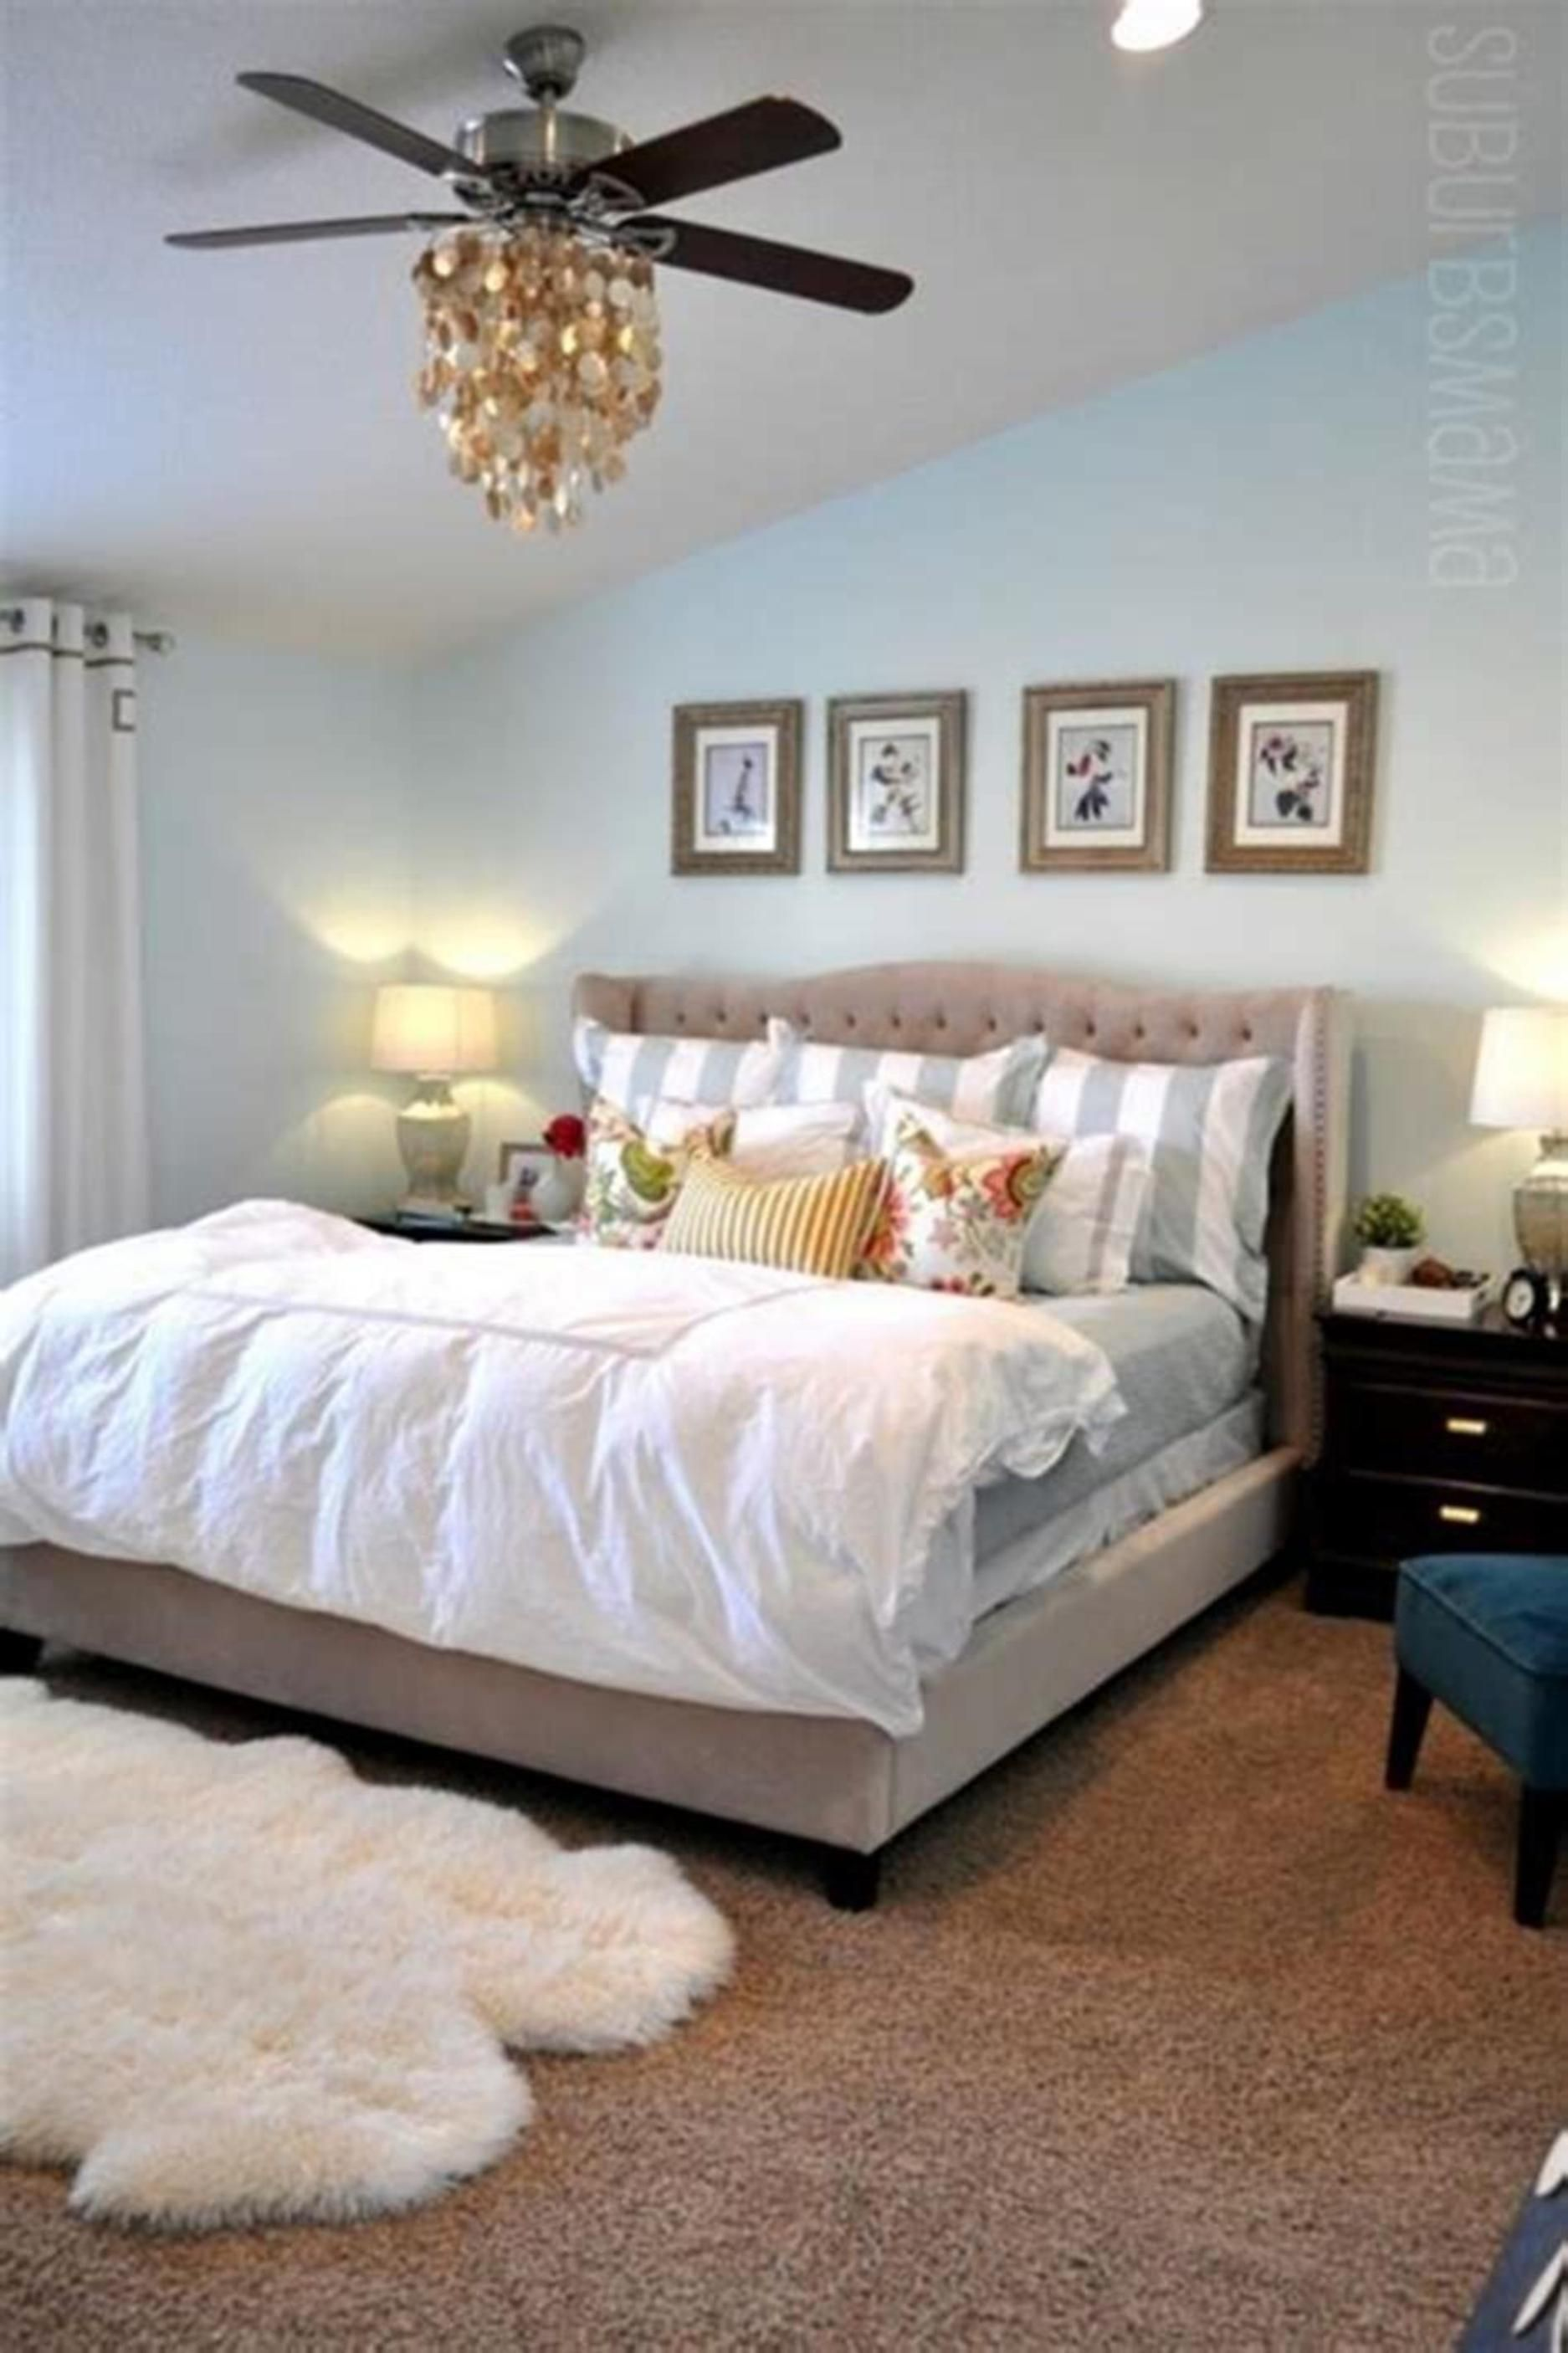 31 Amazing Ideas Master Bedroom Bedding - ComeDecor ...